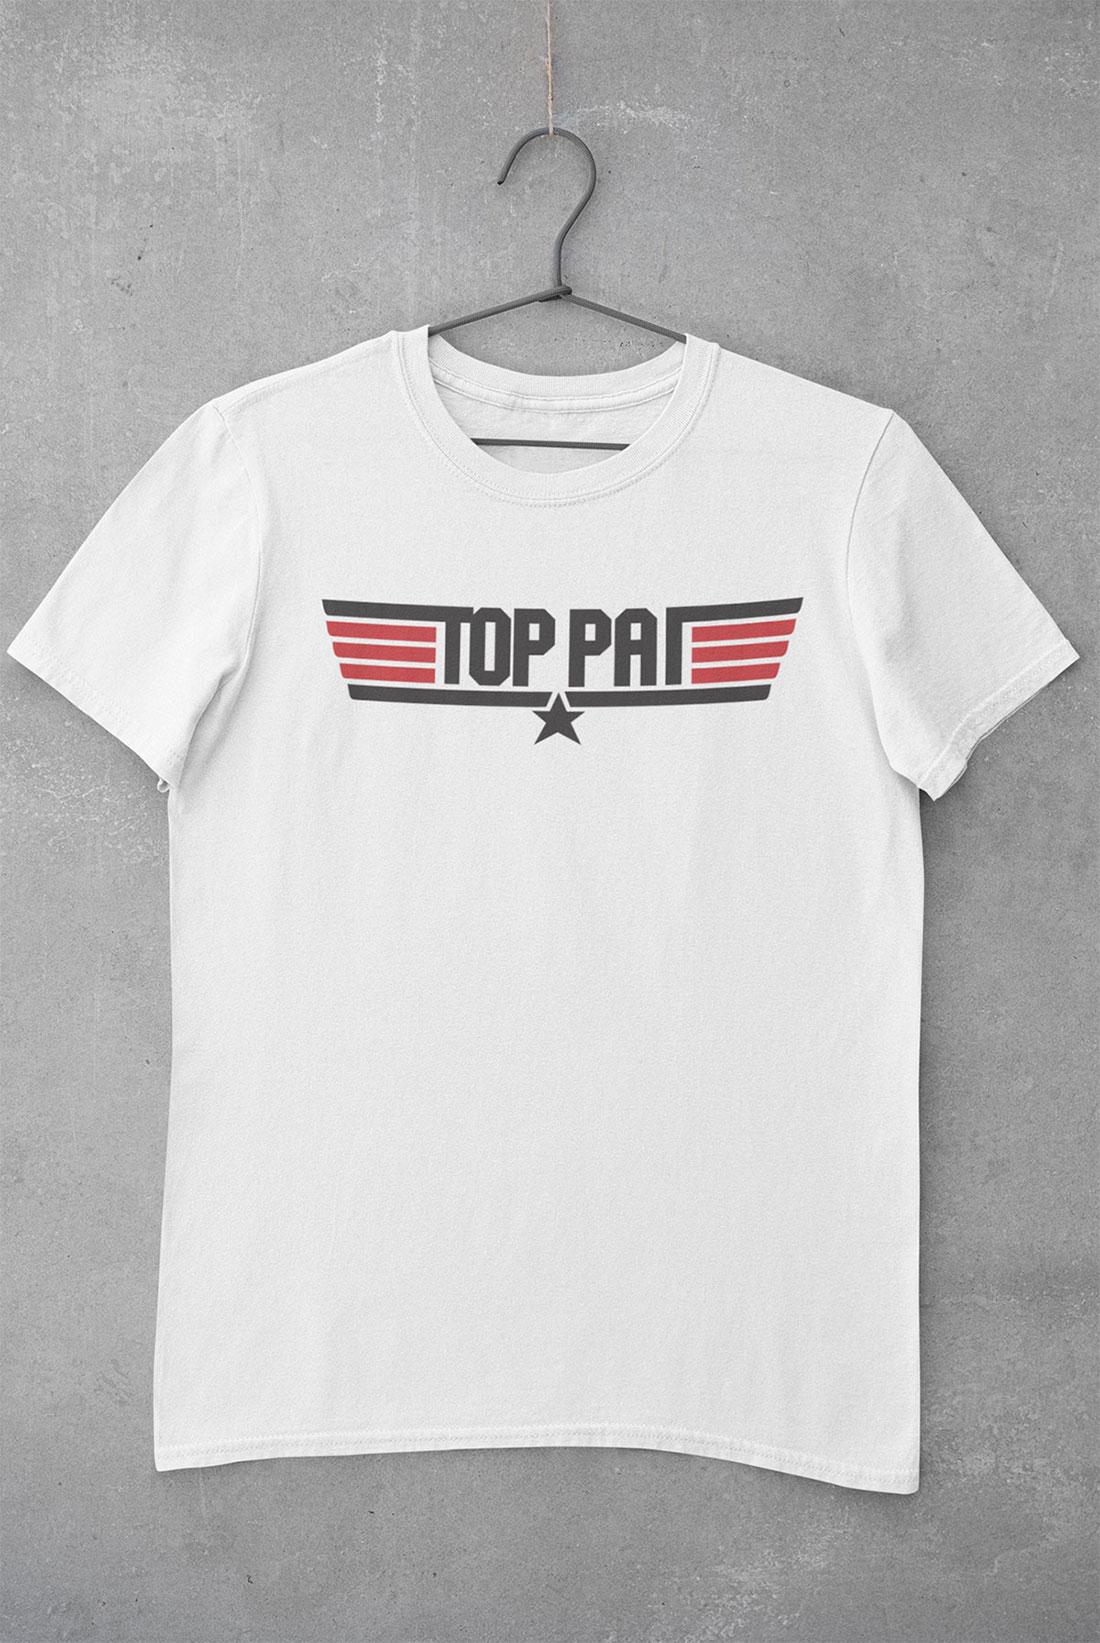 Camiseta Masculina Top Pai